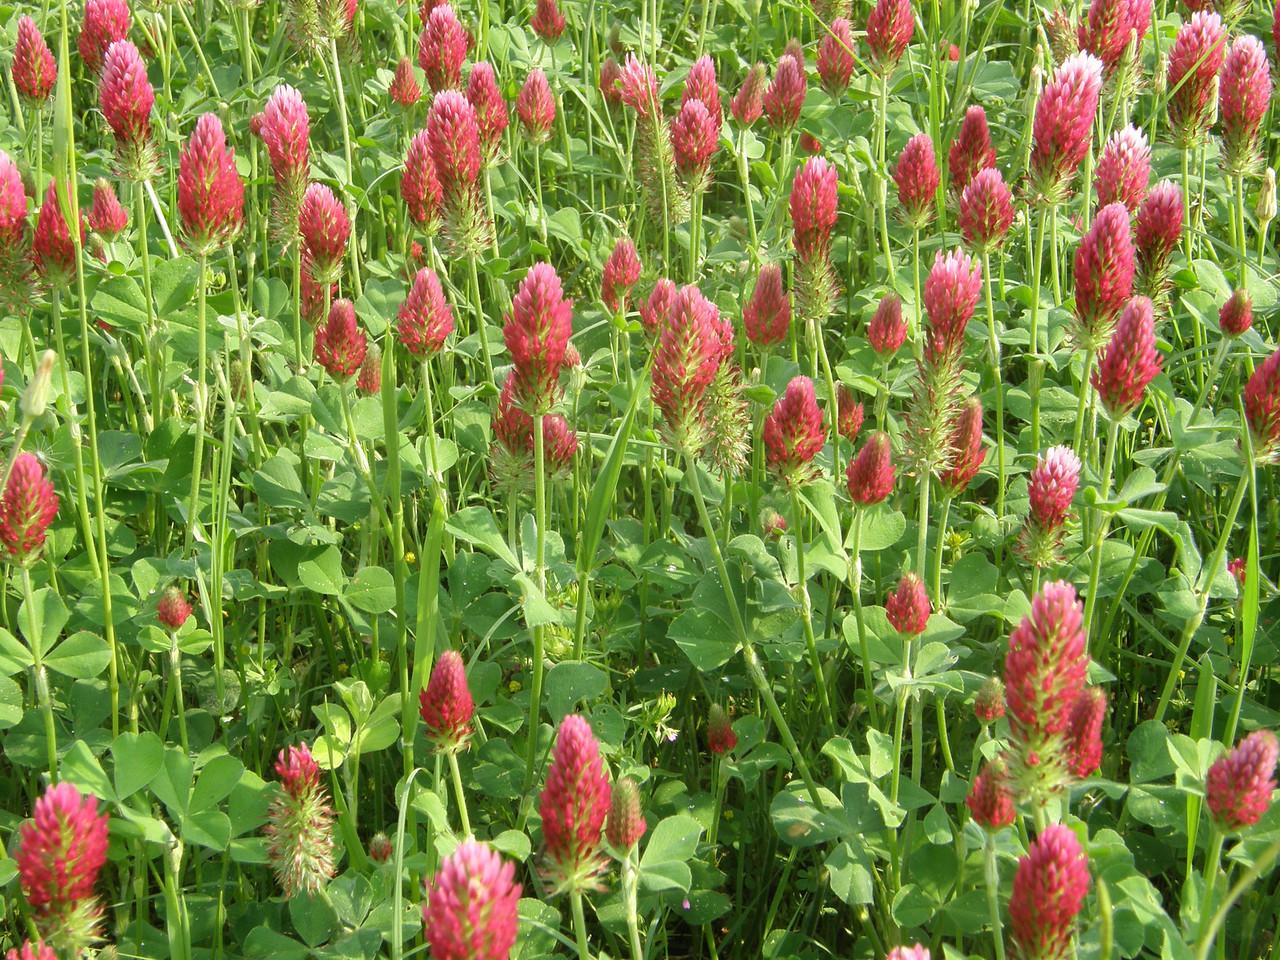 Field of clover.